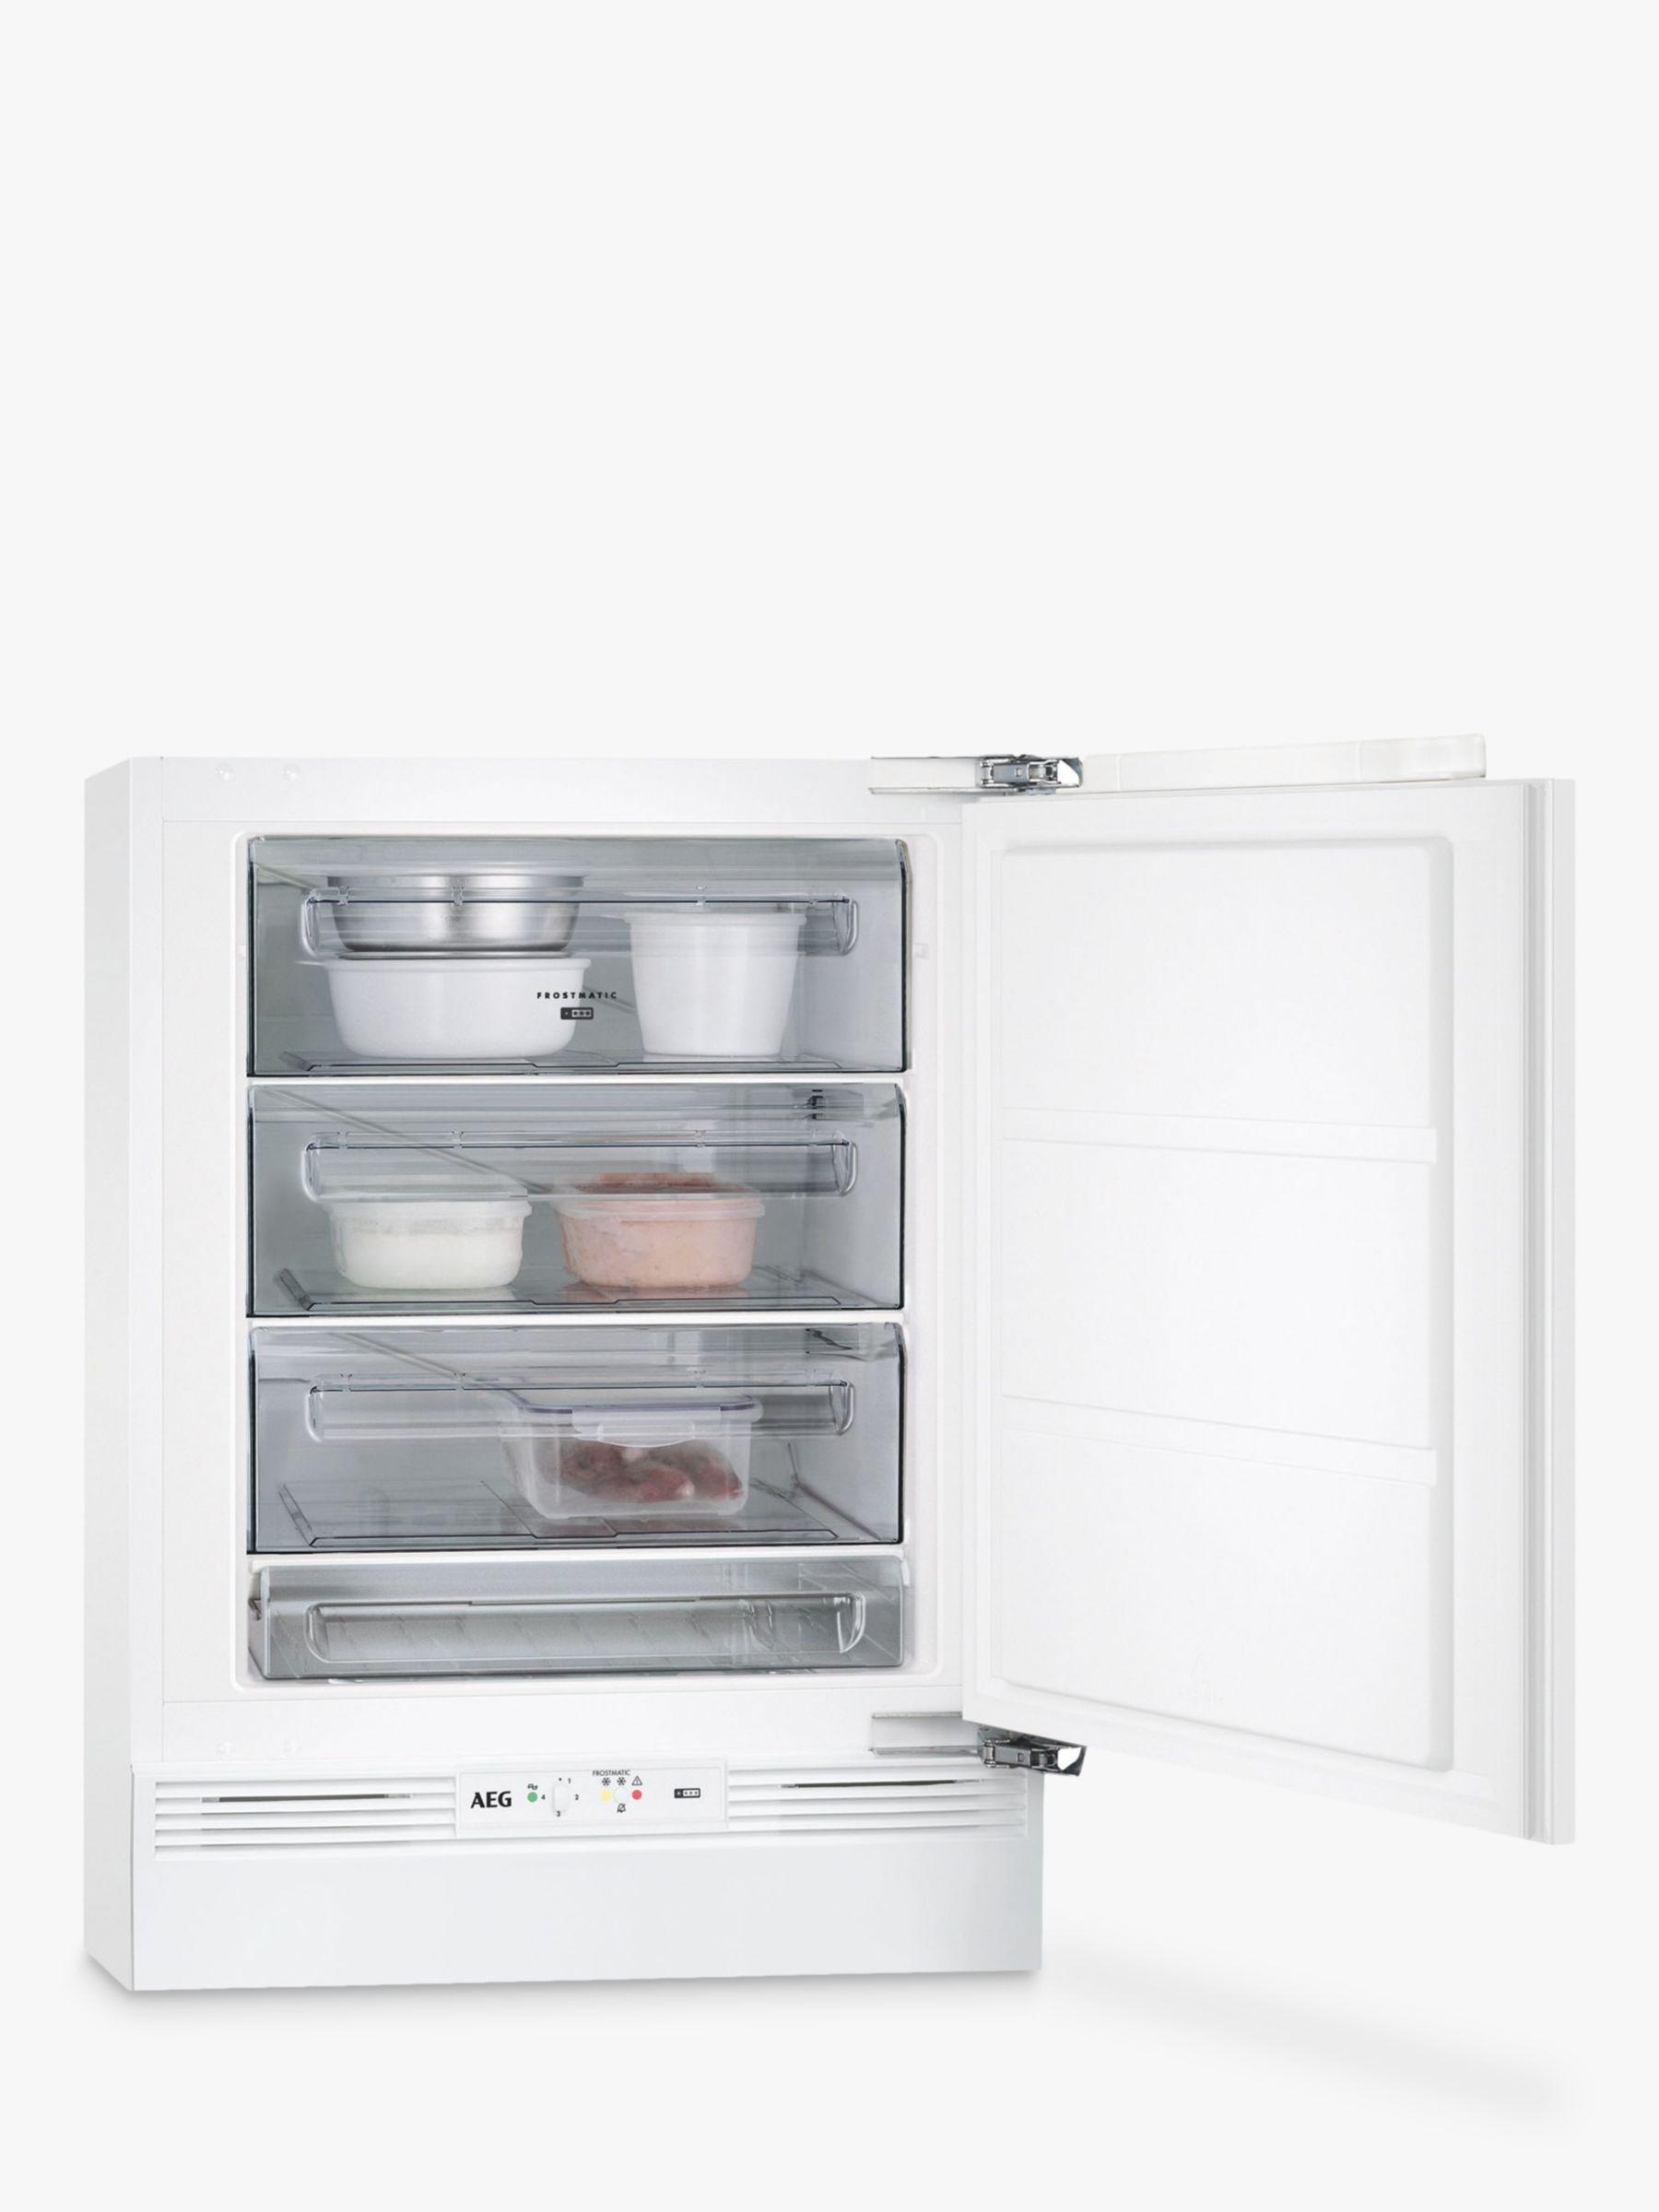 AEG AEG ABE6822VAF Built-Under Freezer, A++ Energy Rating, 60cm Wide, White